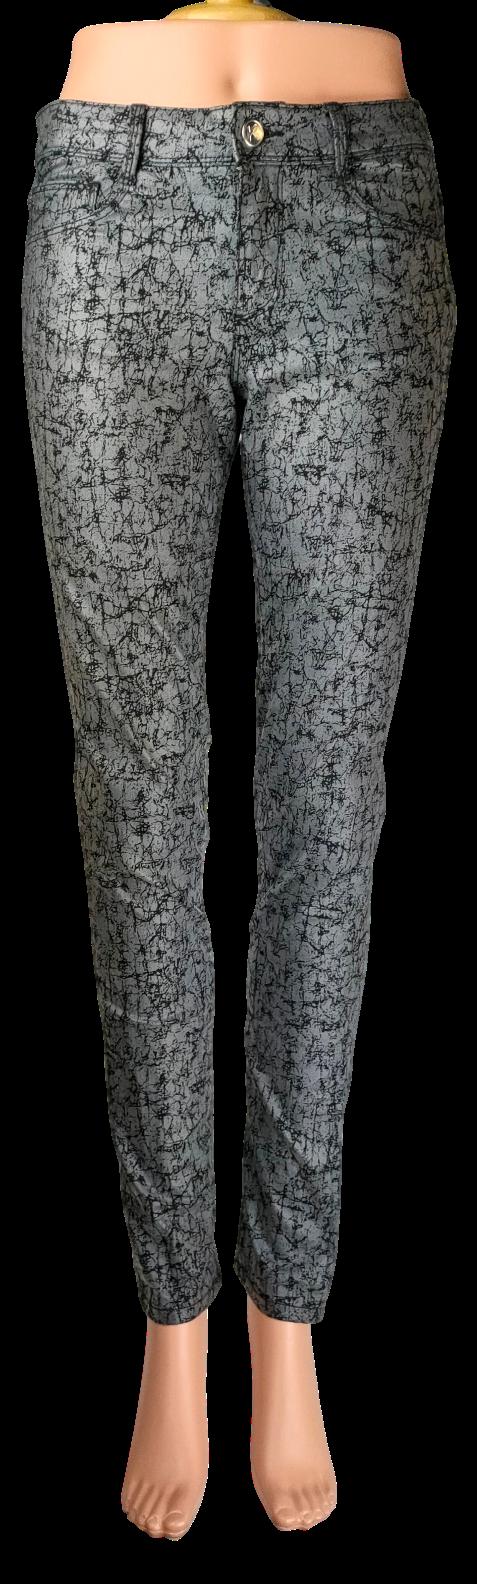 Kookaï - Taille 38